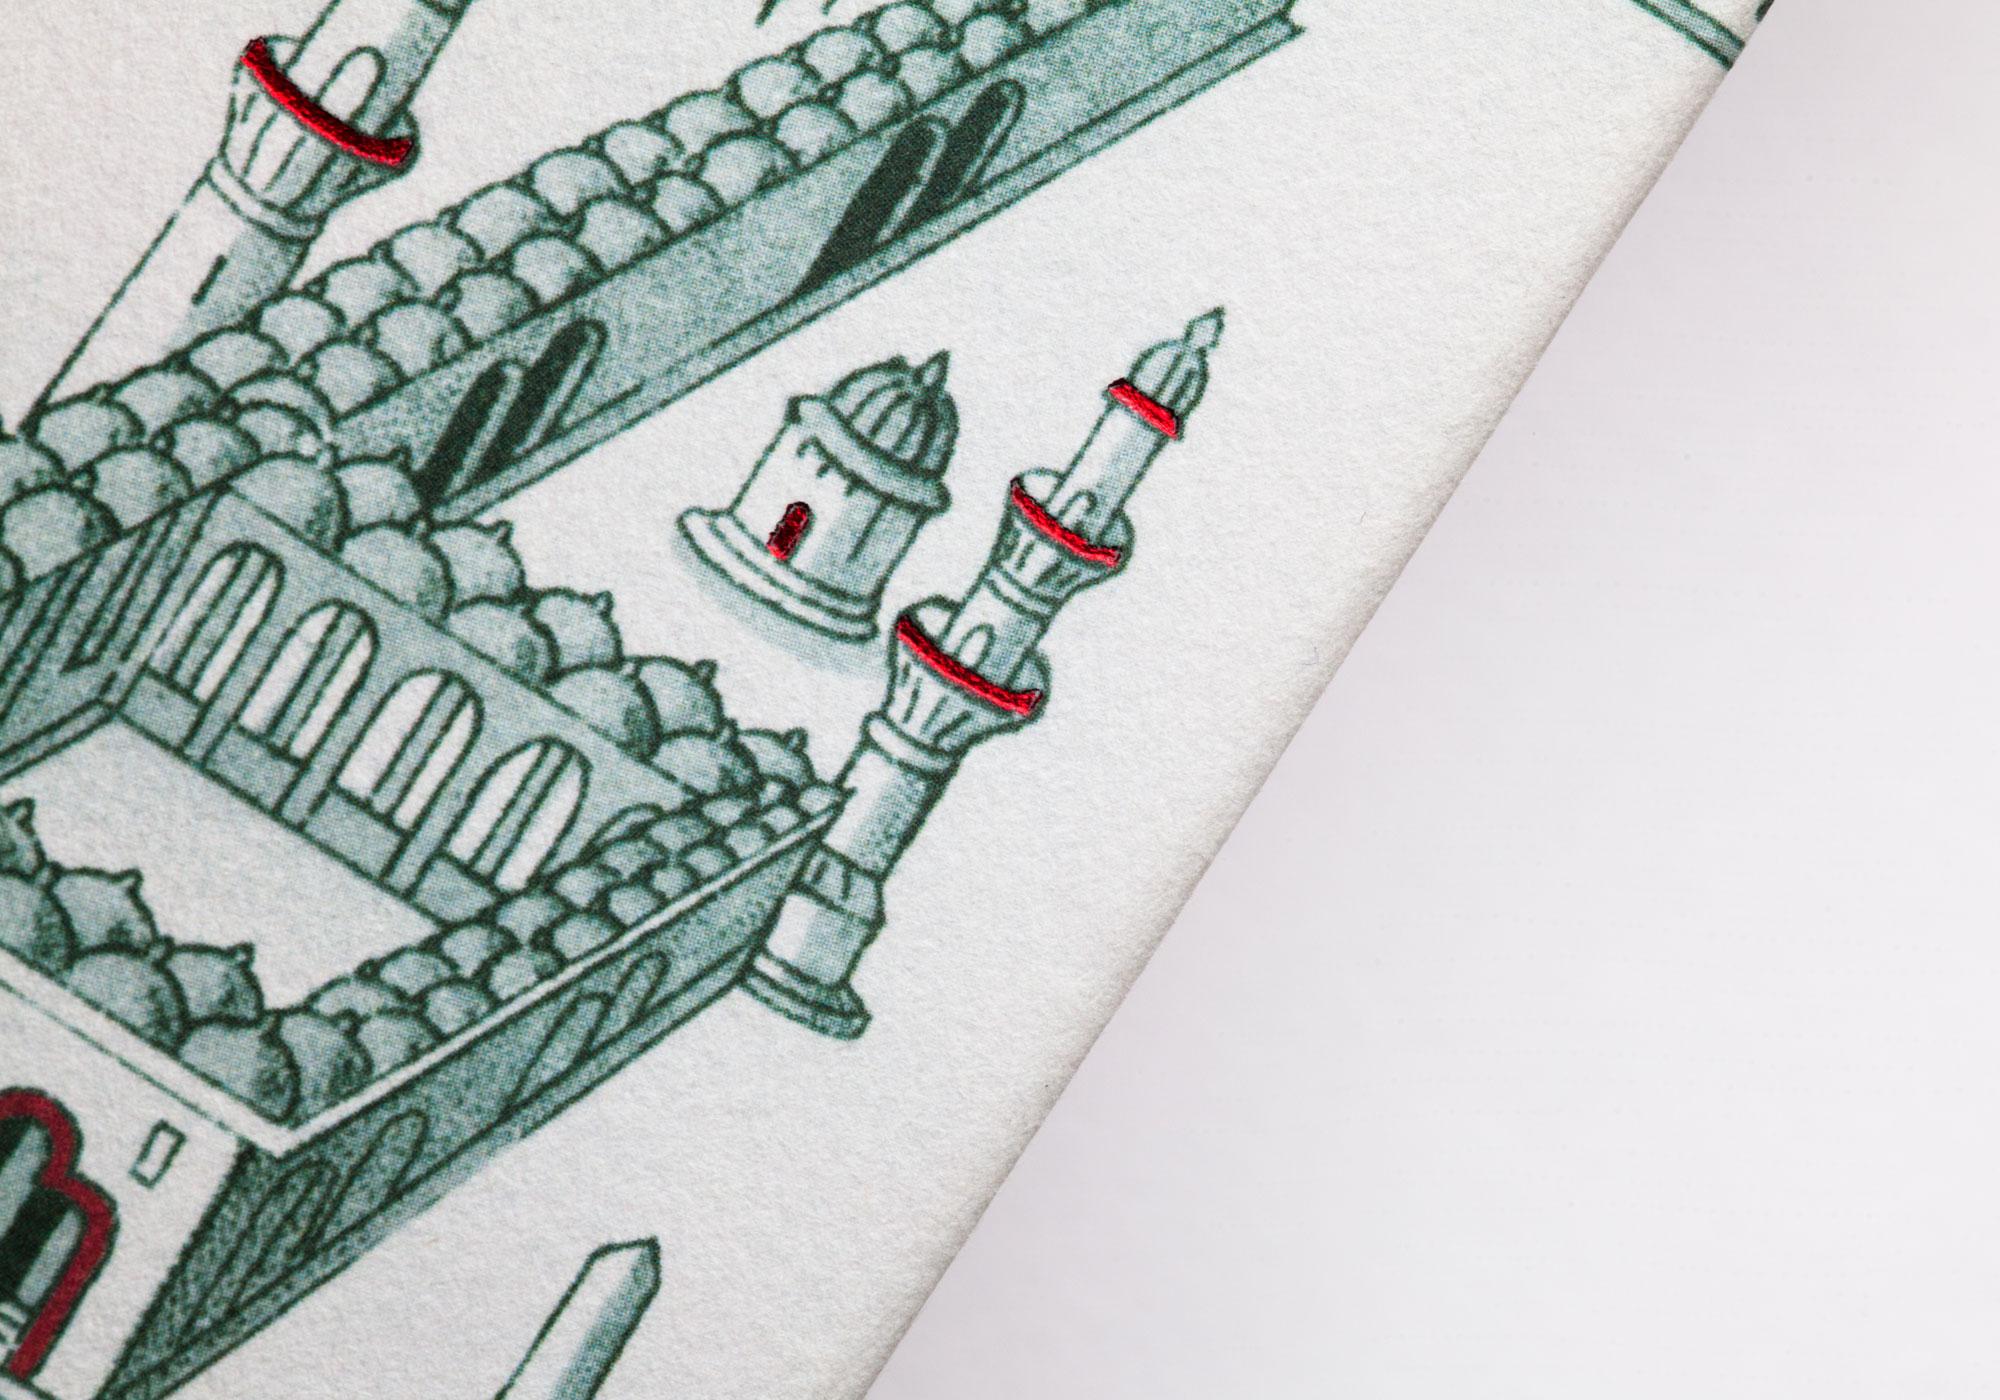 Mecca — Leard: Design Studio of Steve Leard, a Graphic Designer in.